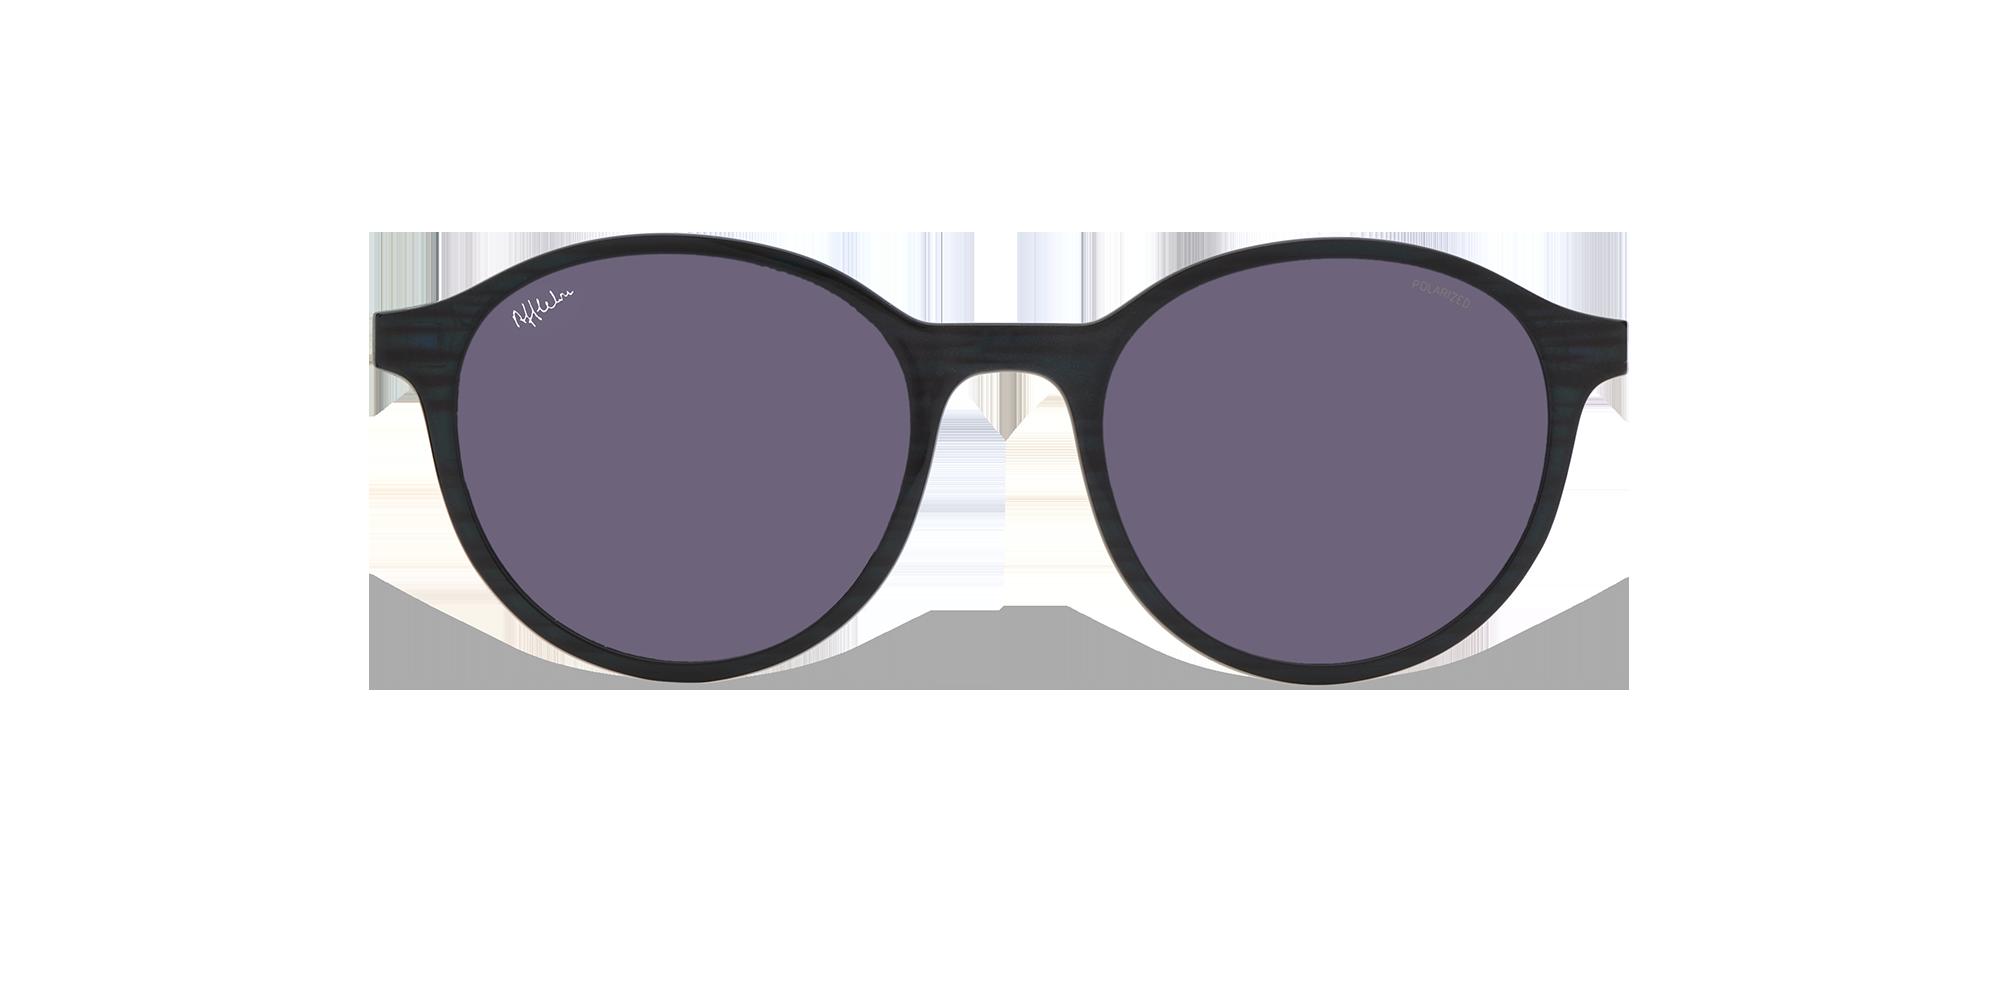 afflelou/france/products/smart_clip/clips_glasses/TMK37POGR014919.png